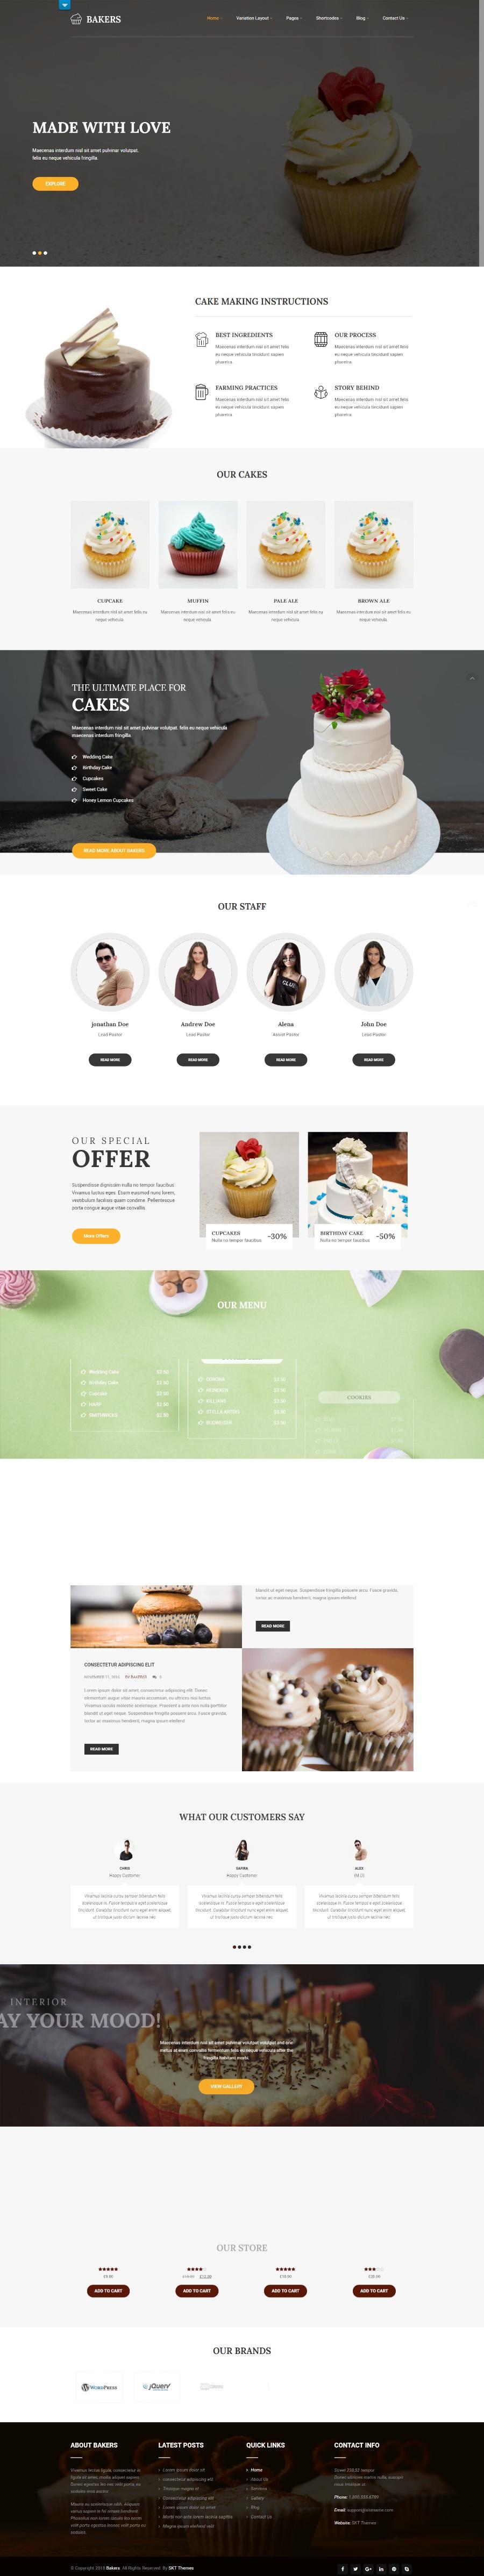 Bakers:烘培面包店免费Wordpress主题